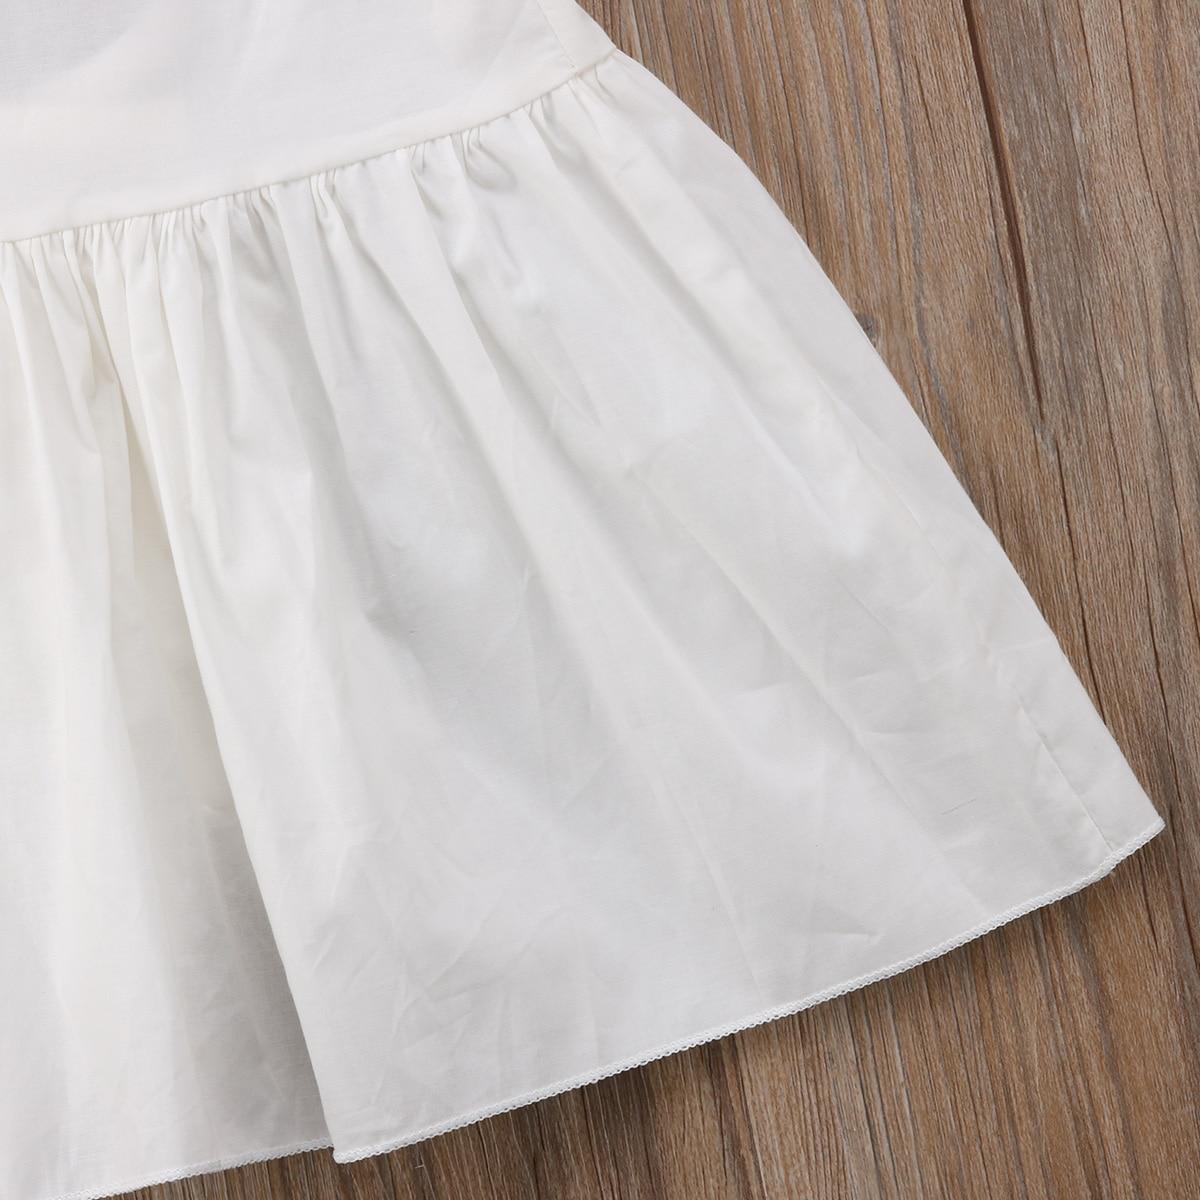 Newborn Toddle Kids Baby Girls Backless Sleeveless Dress Tops Sundress Mini Dress Cotton Summer Clothes Casual Baby Girl 0-3T